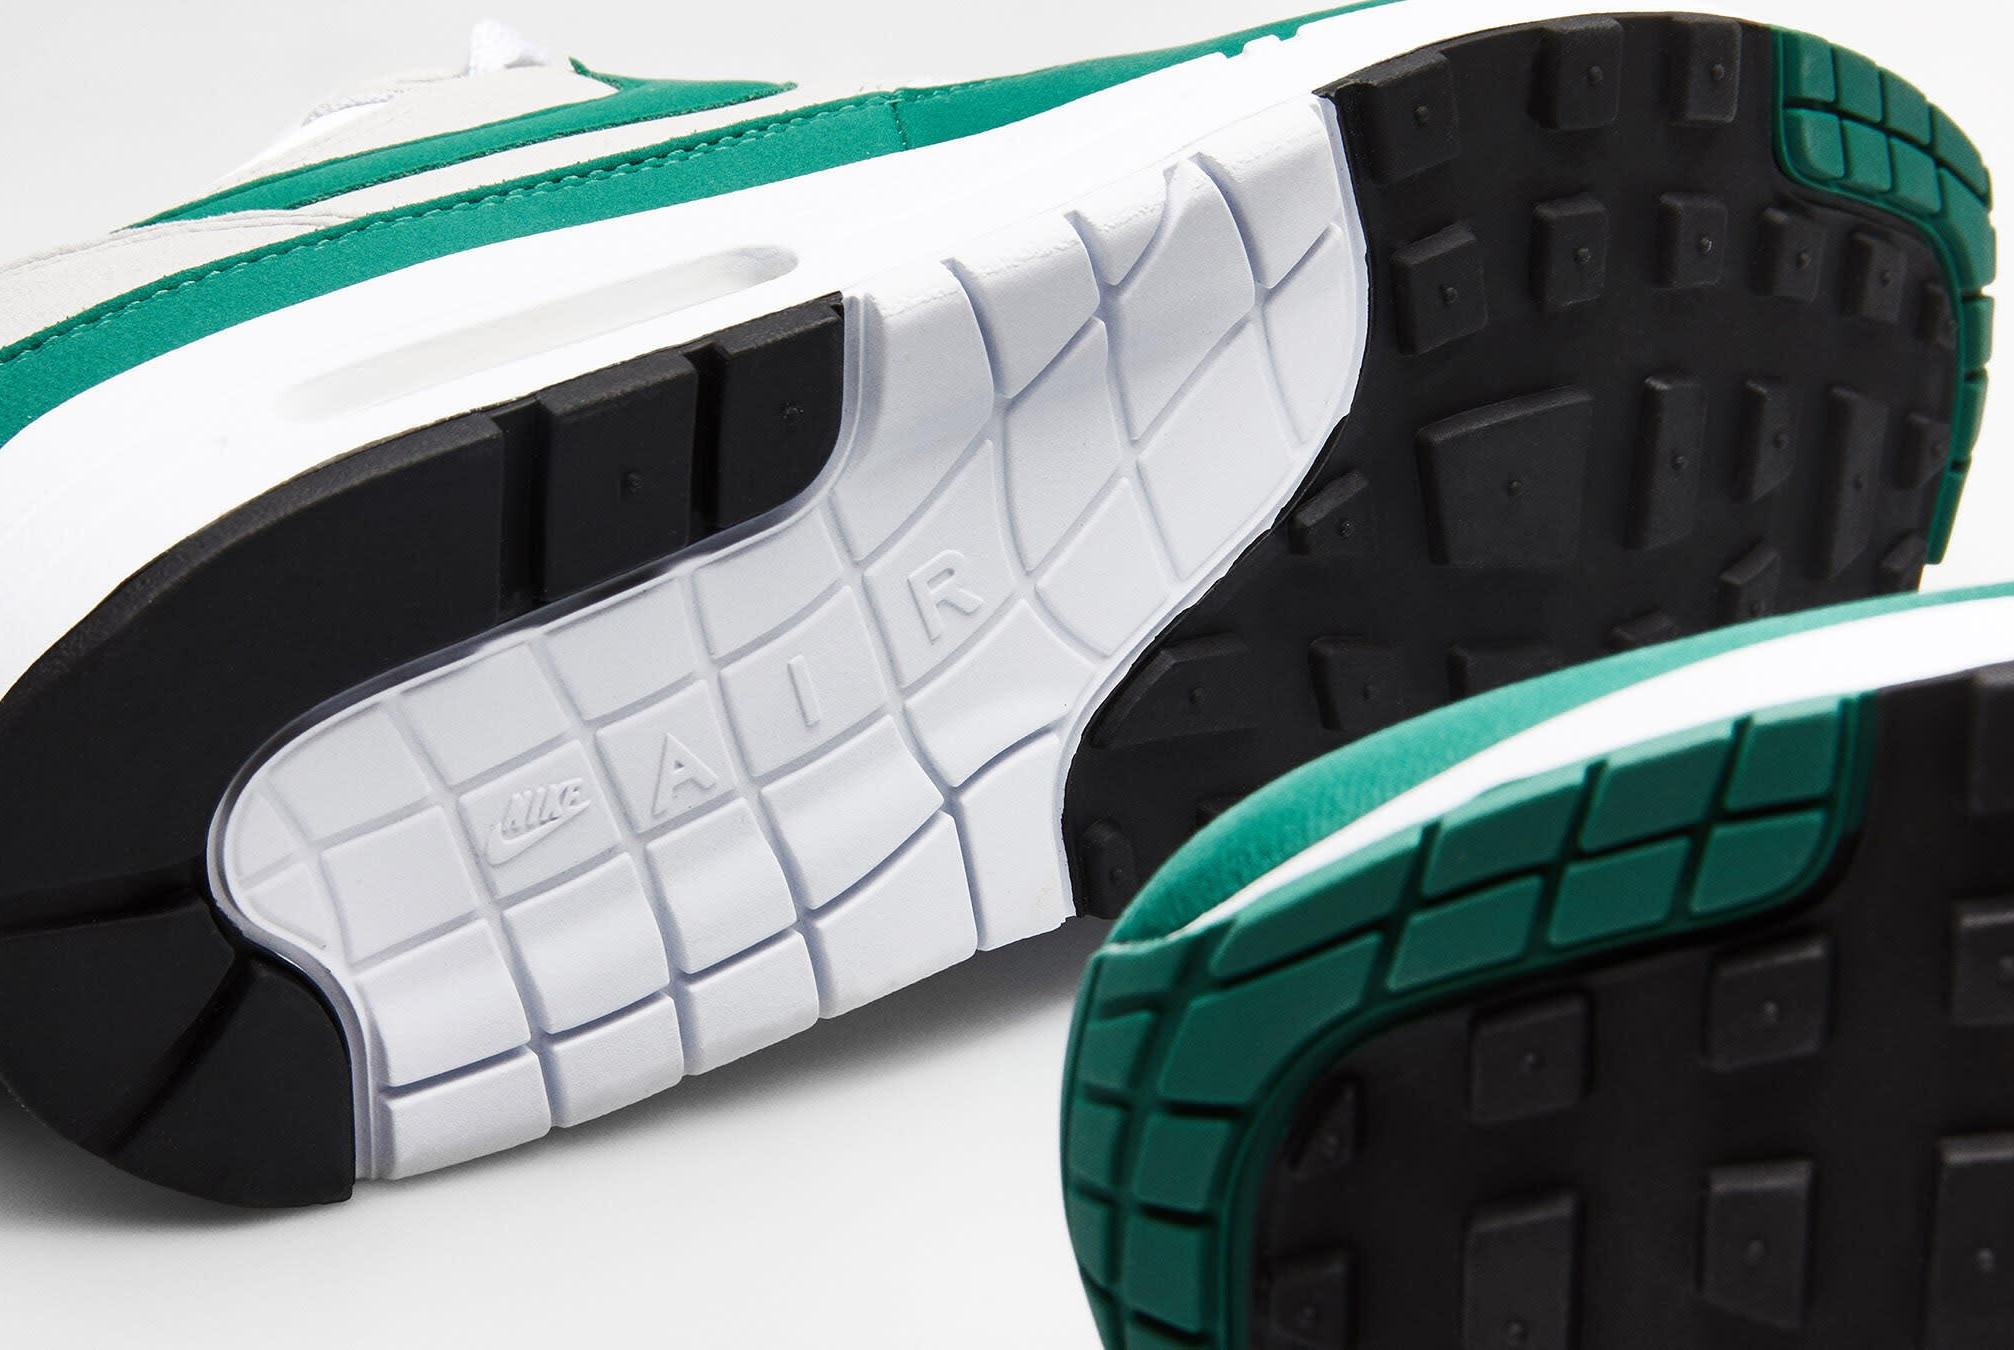 Nike Air Max 1 1987 verte grise et blanche (4)